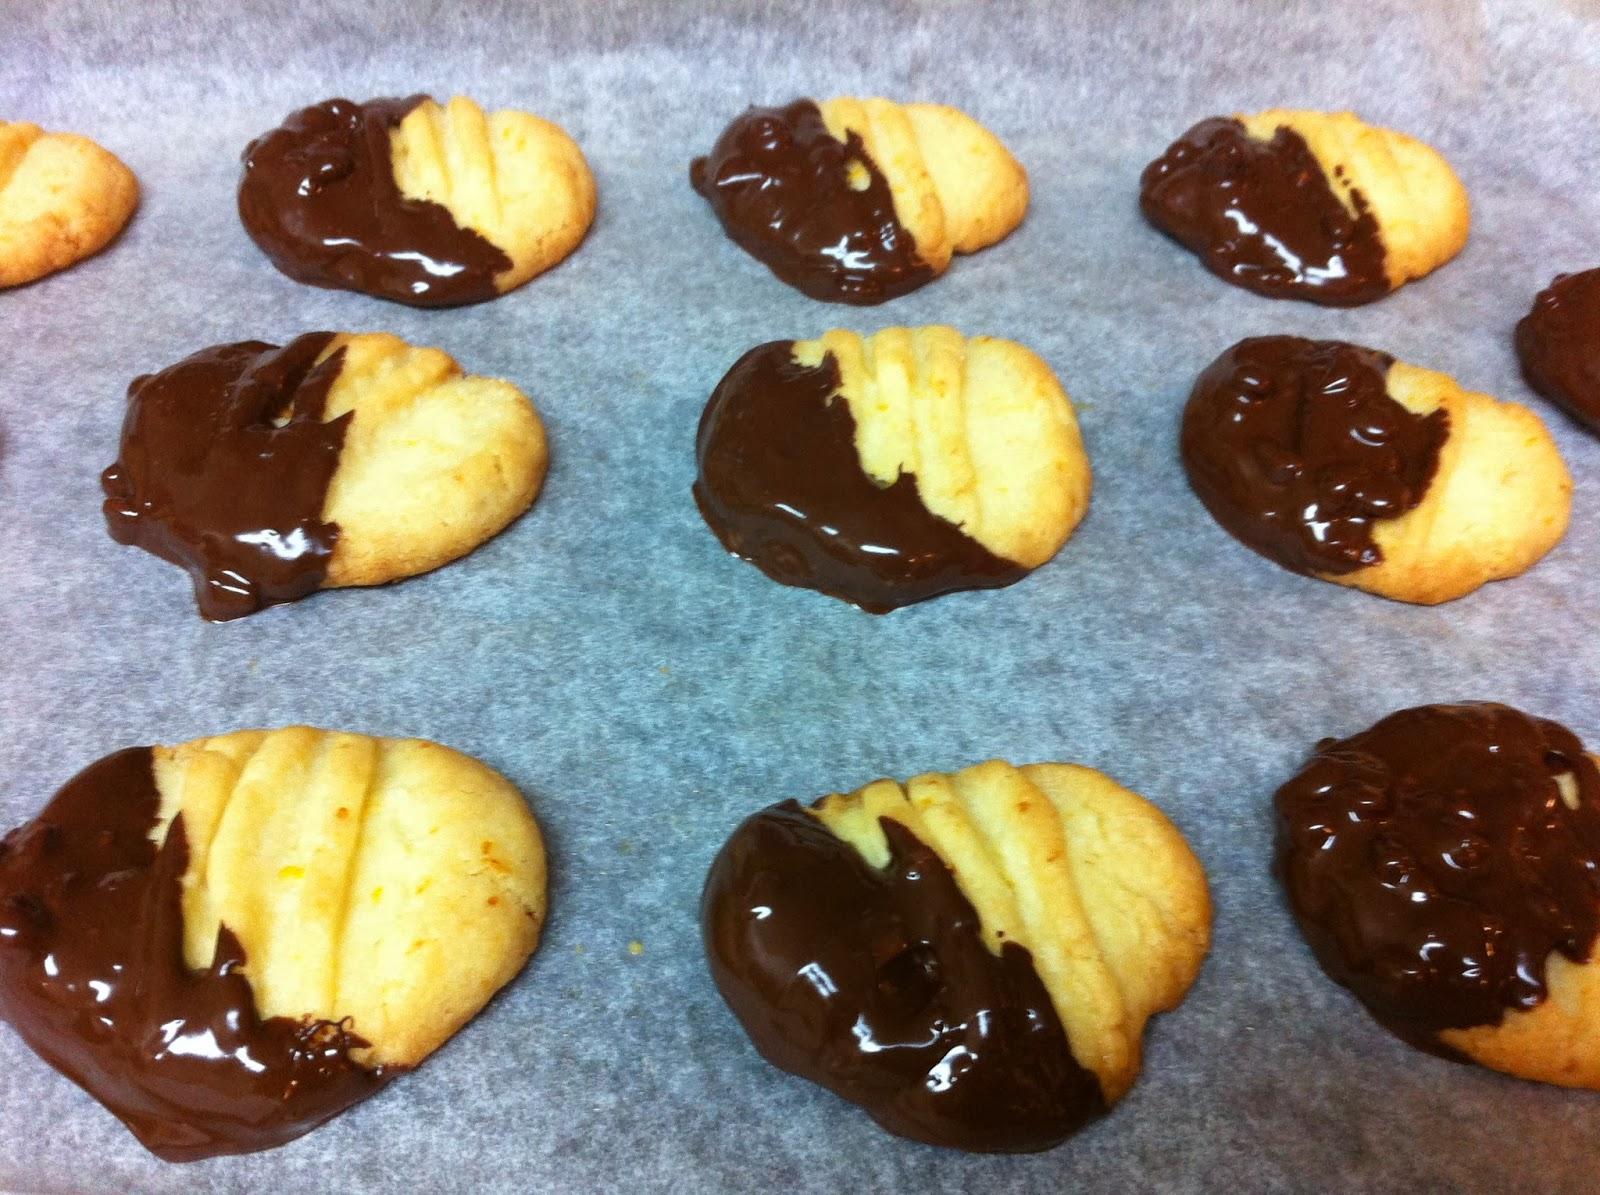 The Food Nerd`s Diary: Chocolate dipped orange cookies